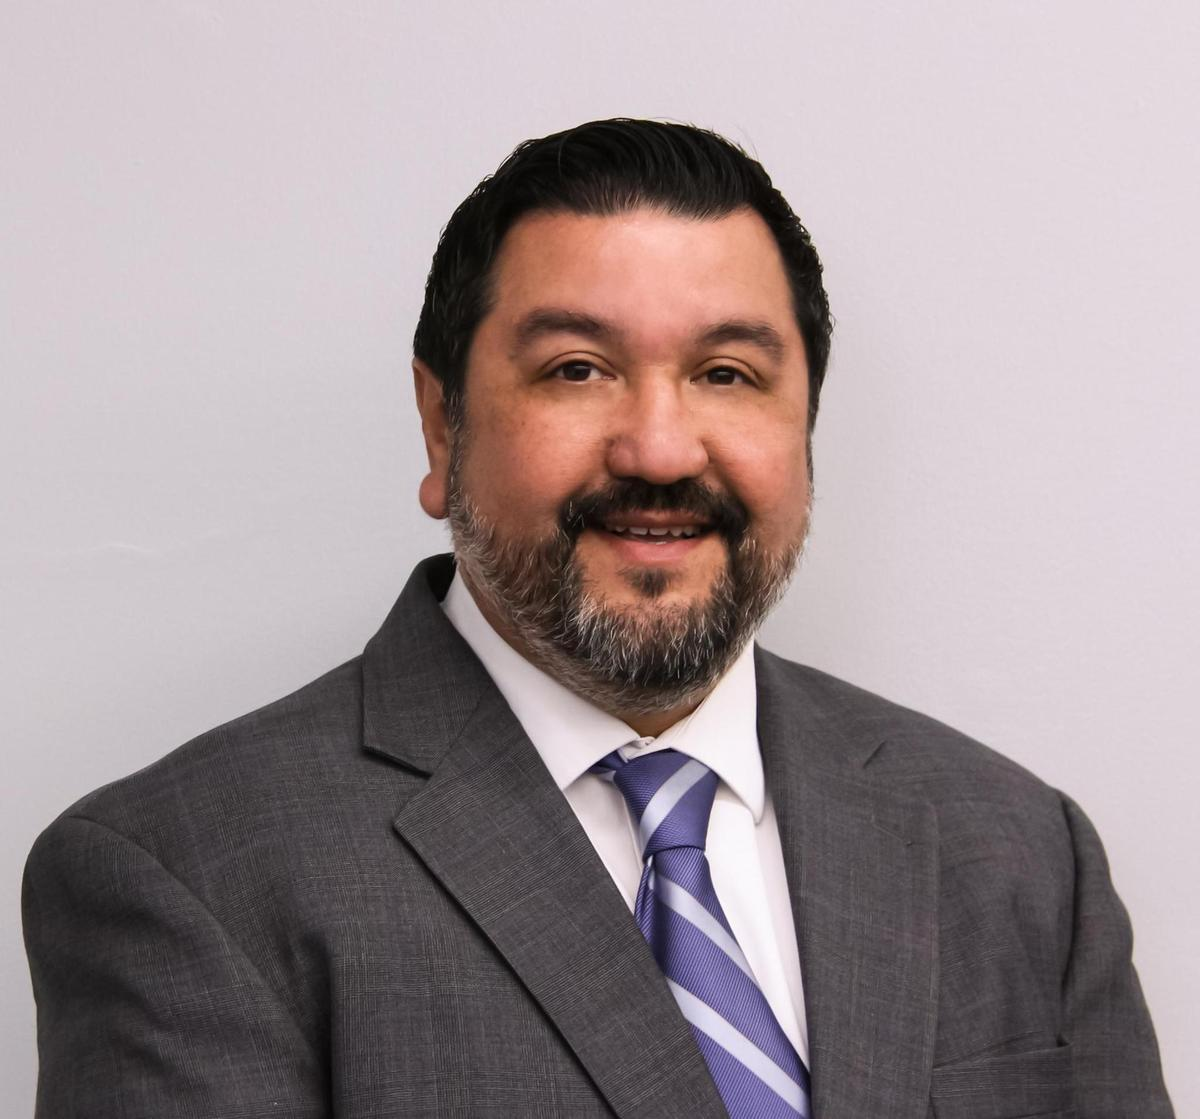 Alejandro Gonzalez, Executive Director